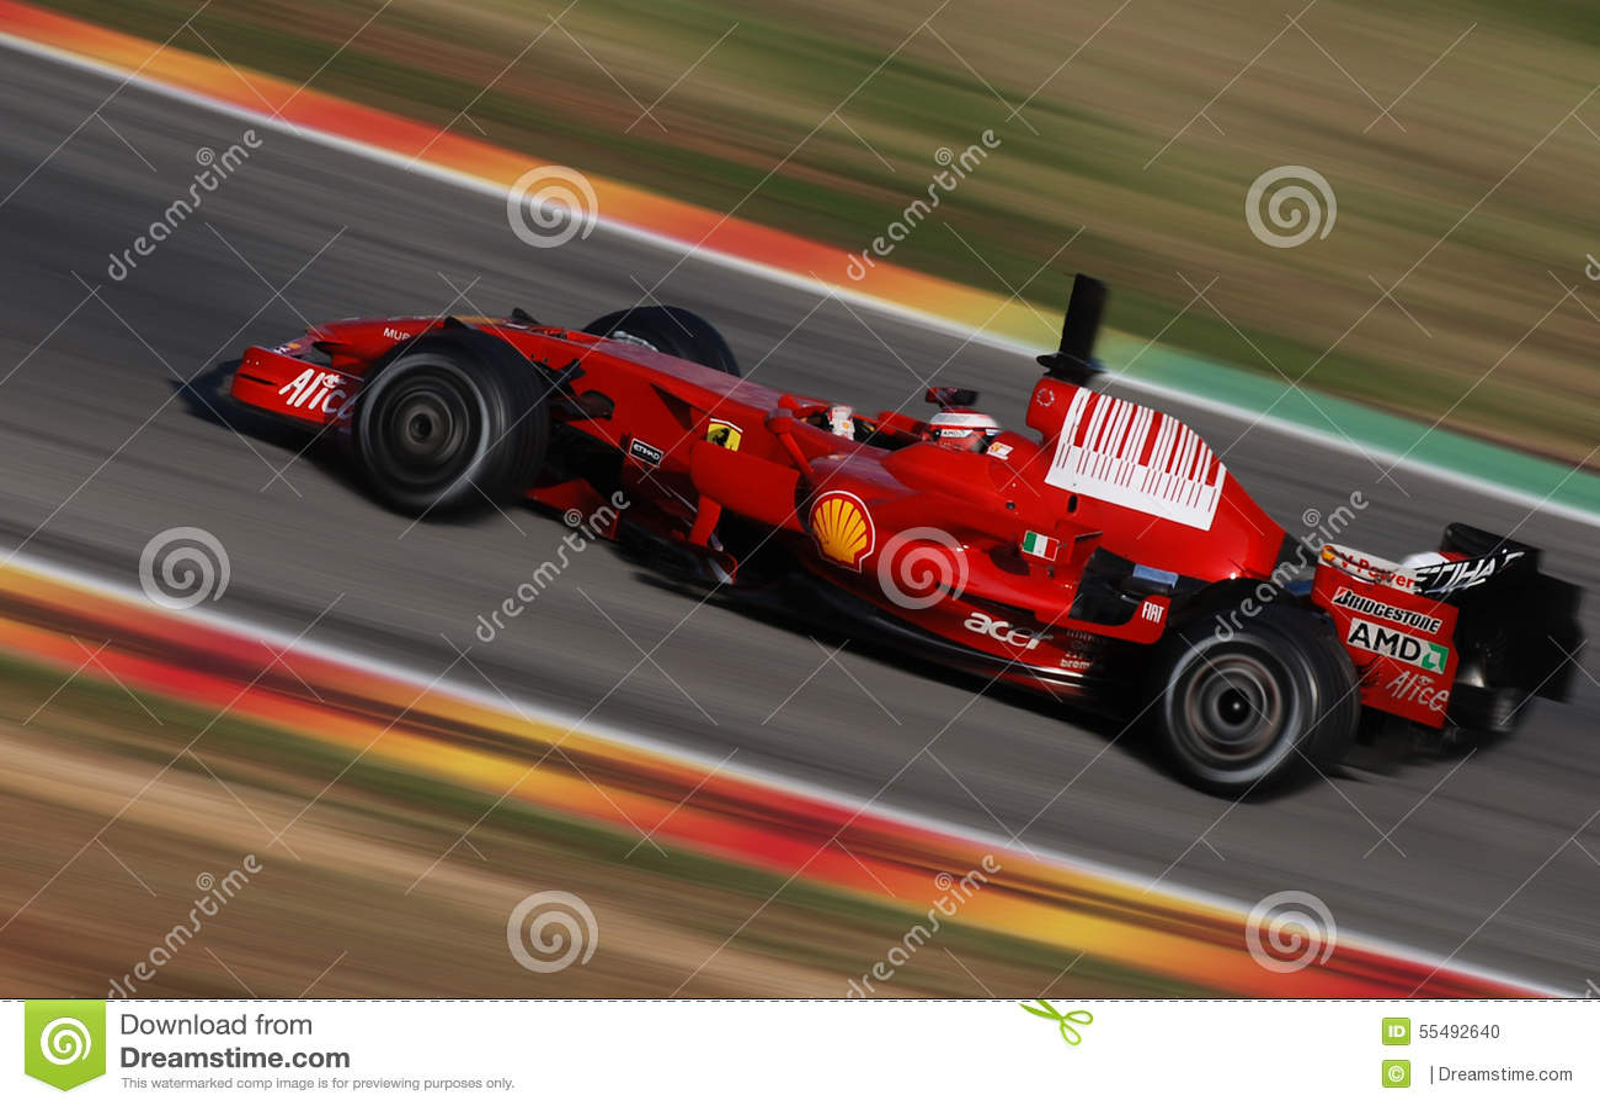 Ferrari F1 Schumacher